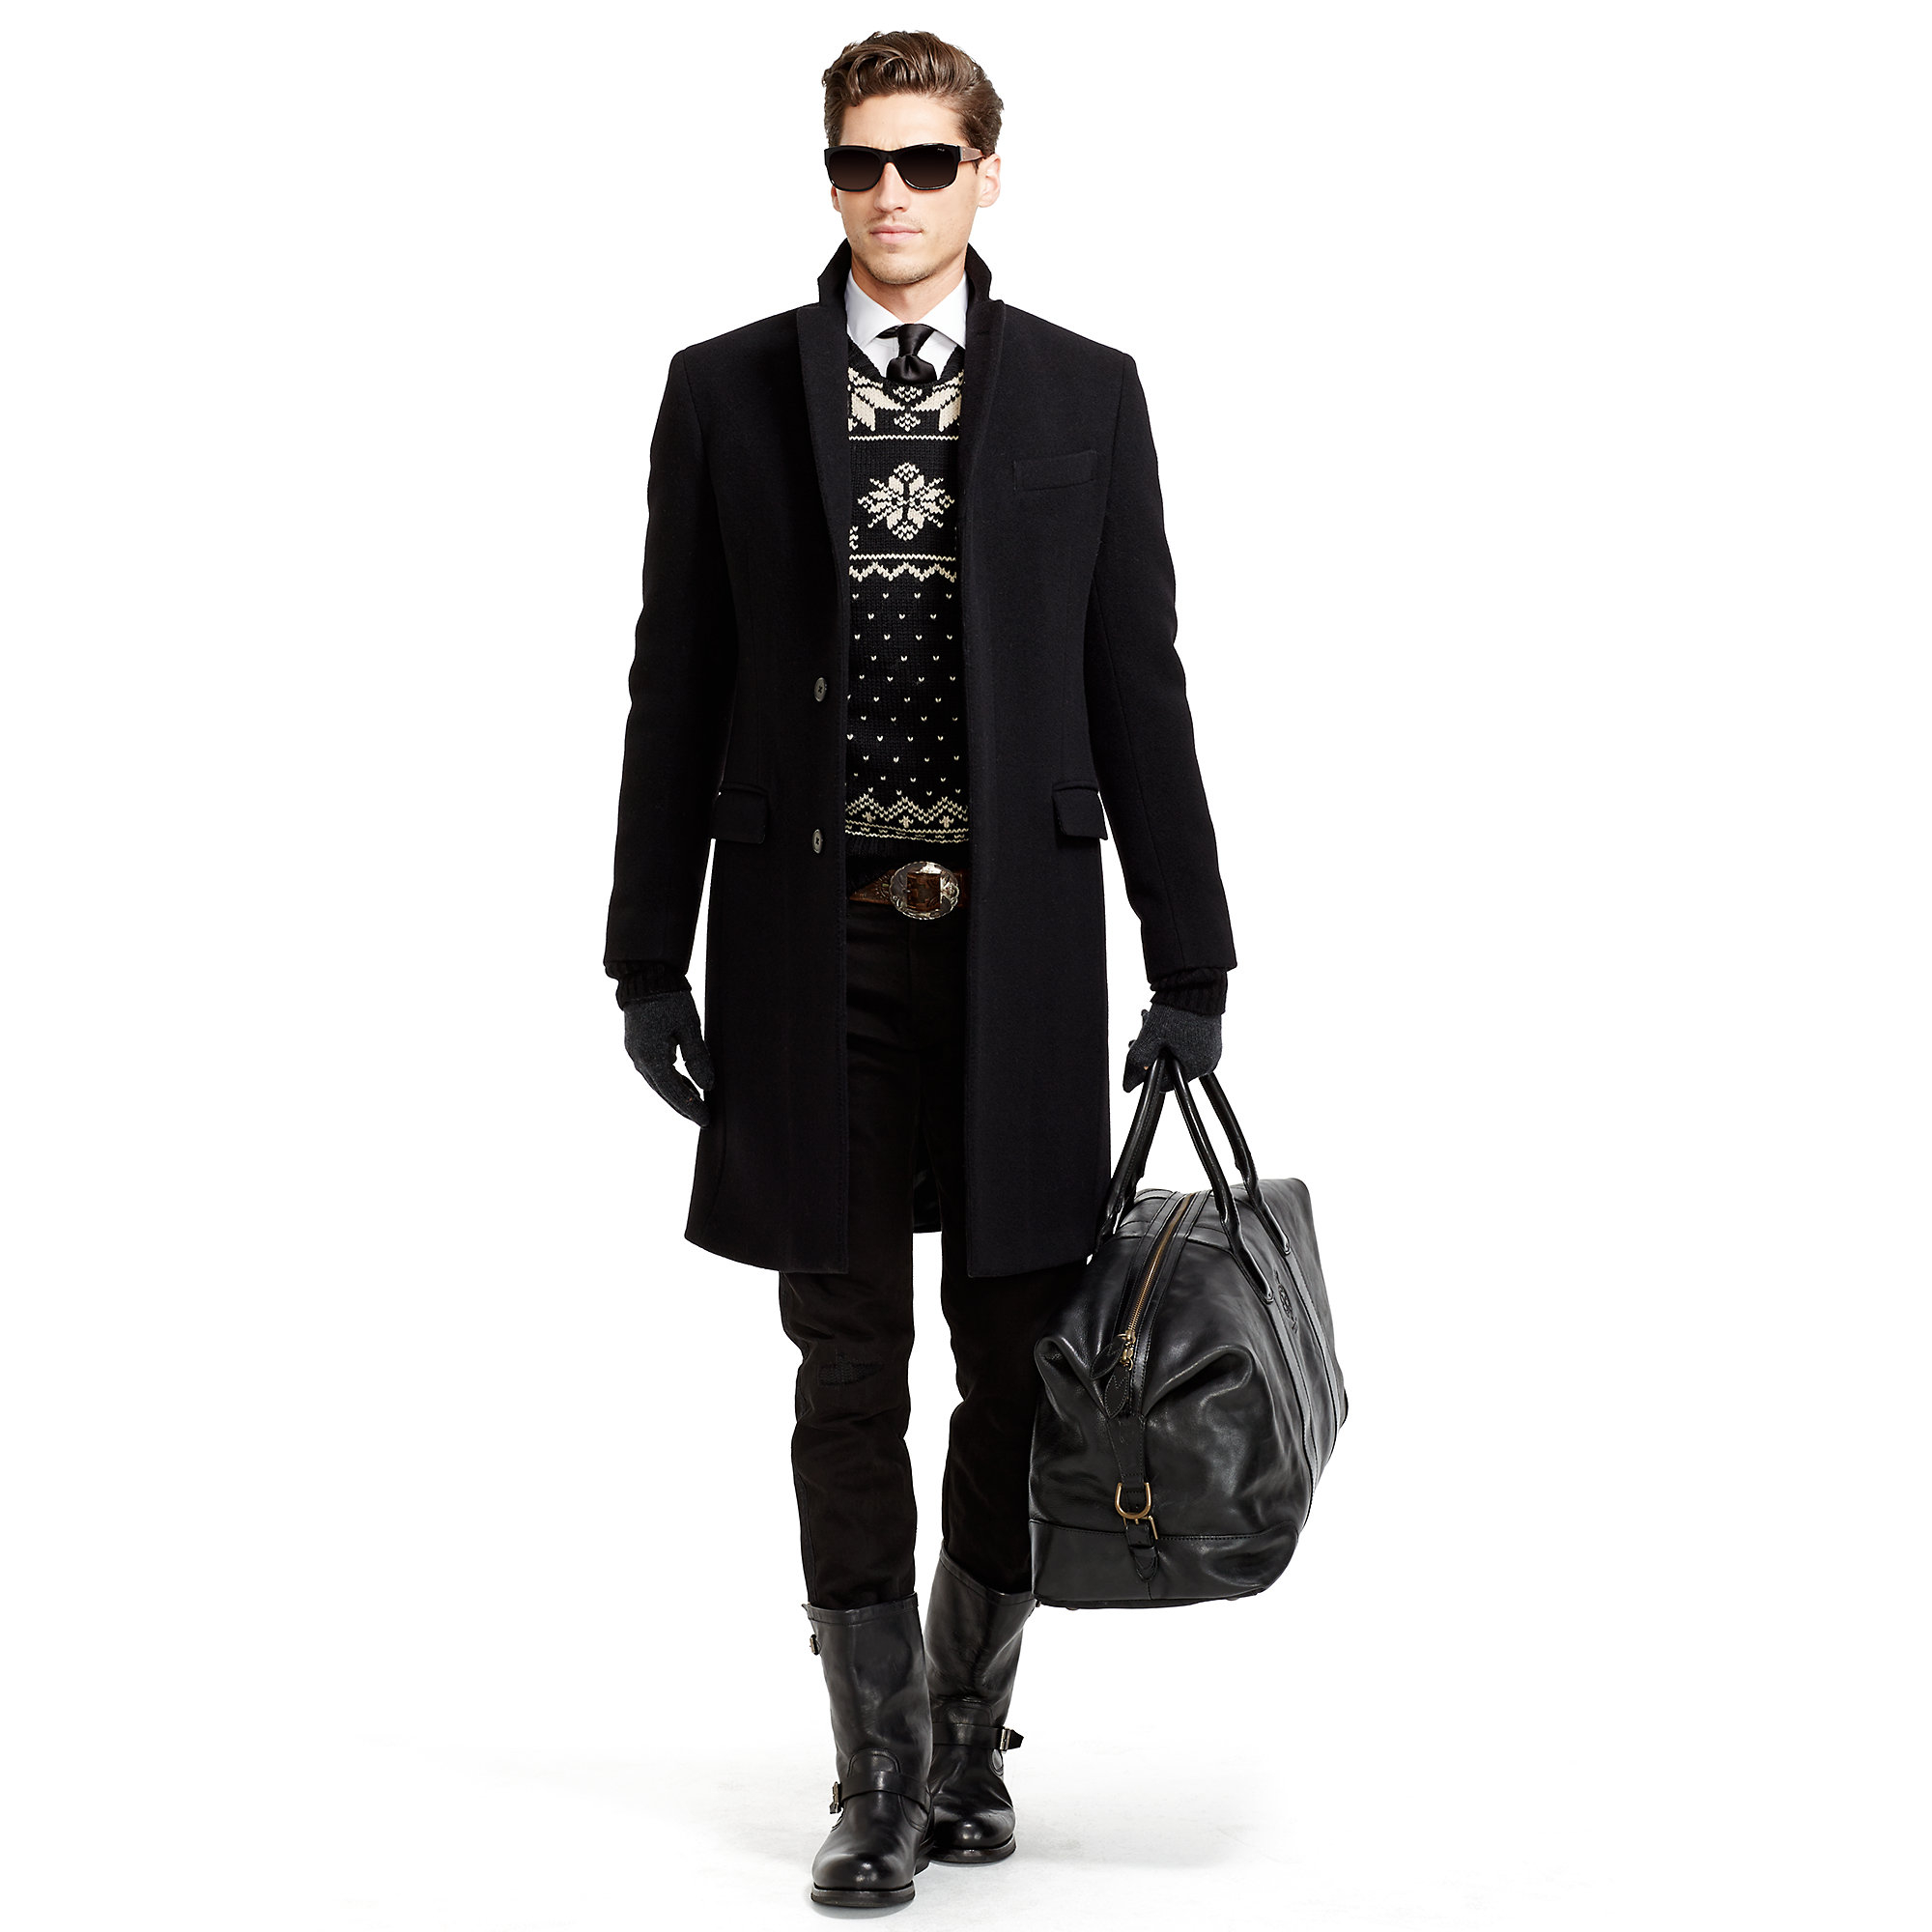 7a1d63911f11 Lyst - Polo Ralph Lauren Leather Duffel Bag in Black for Men